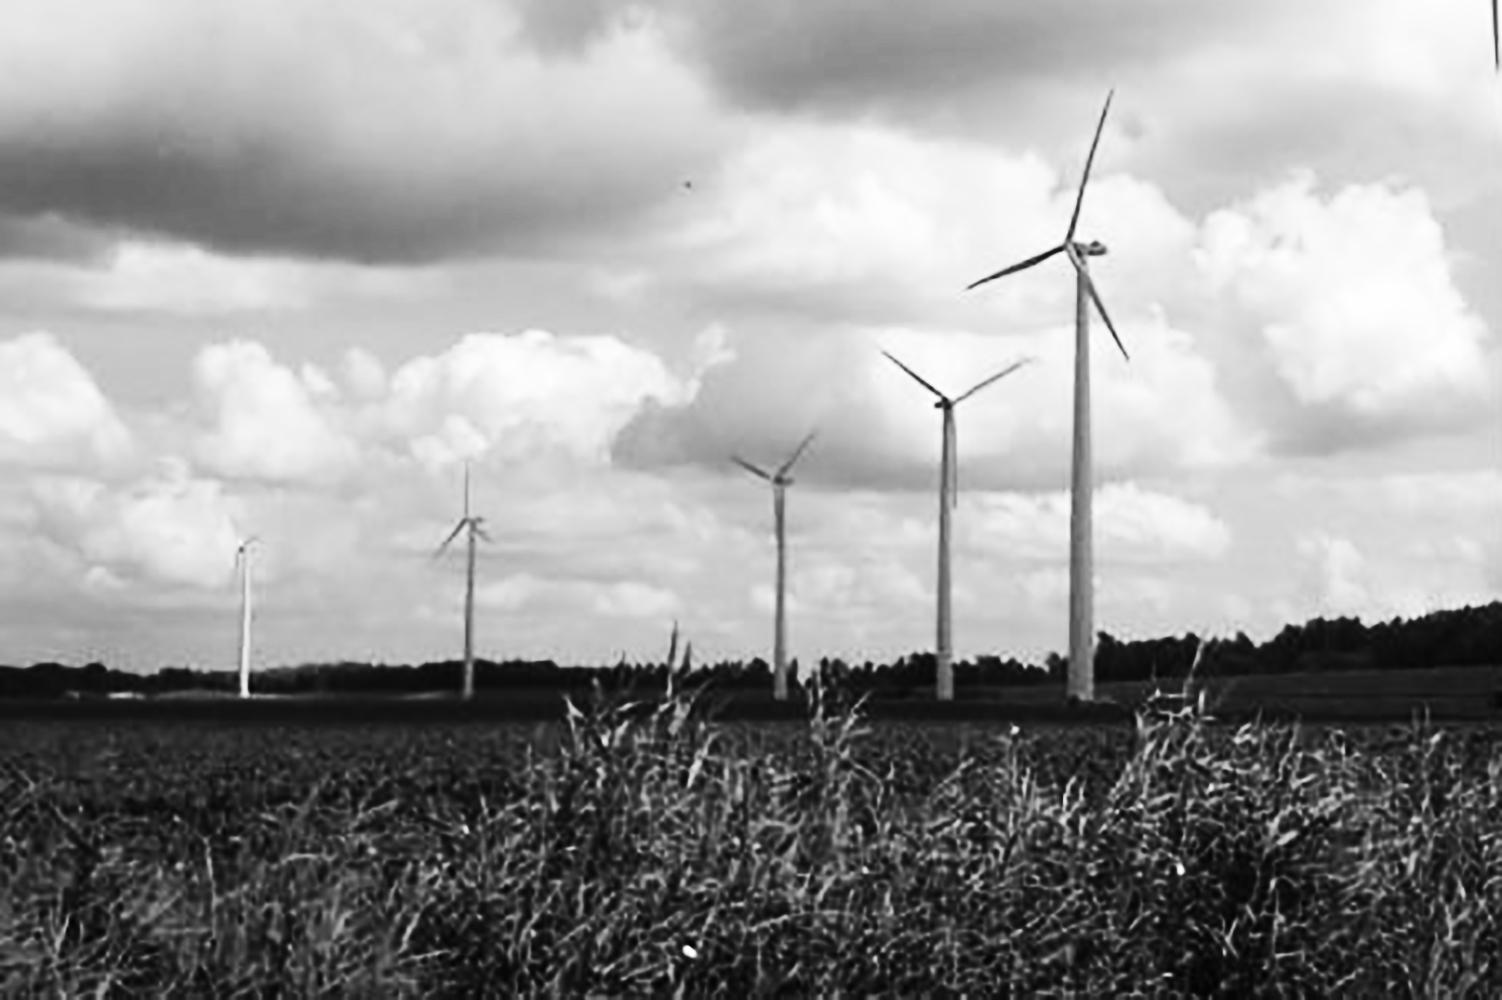 Groen licht windmolenpark Veenkoloniën